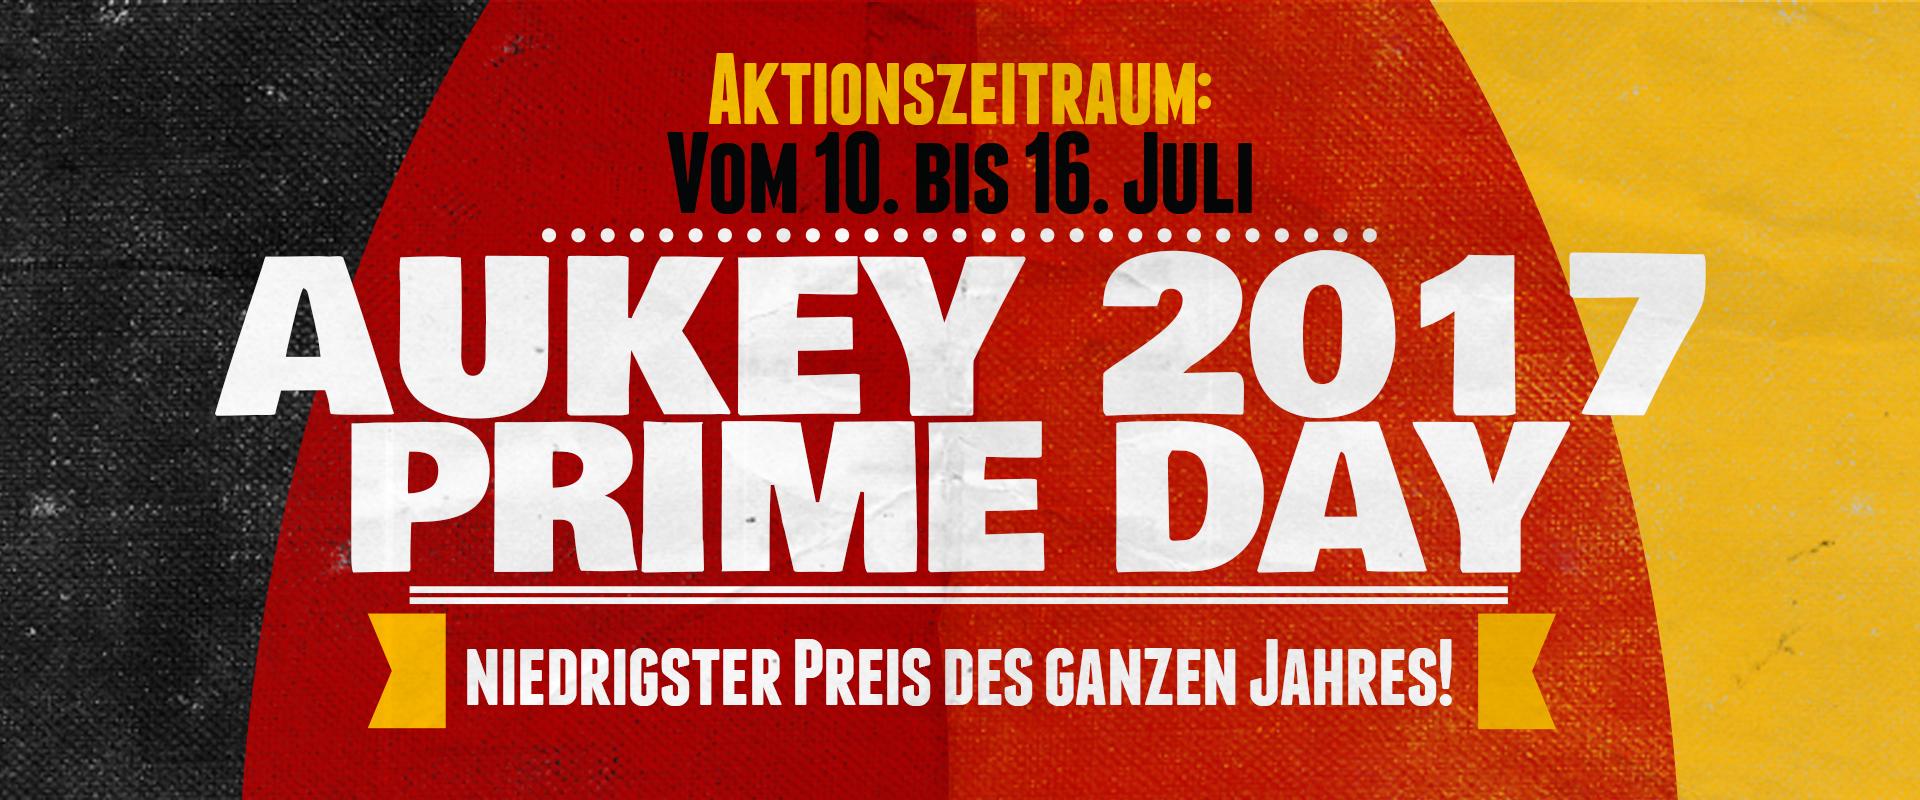 Aukey Sonderangebote zum Amazon Prime Day